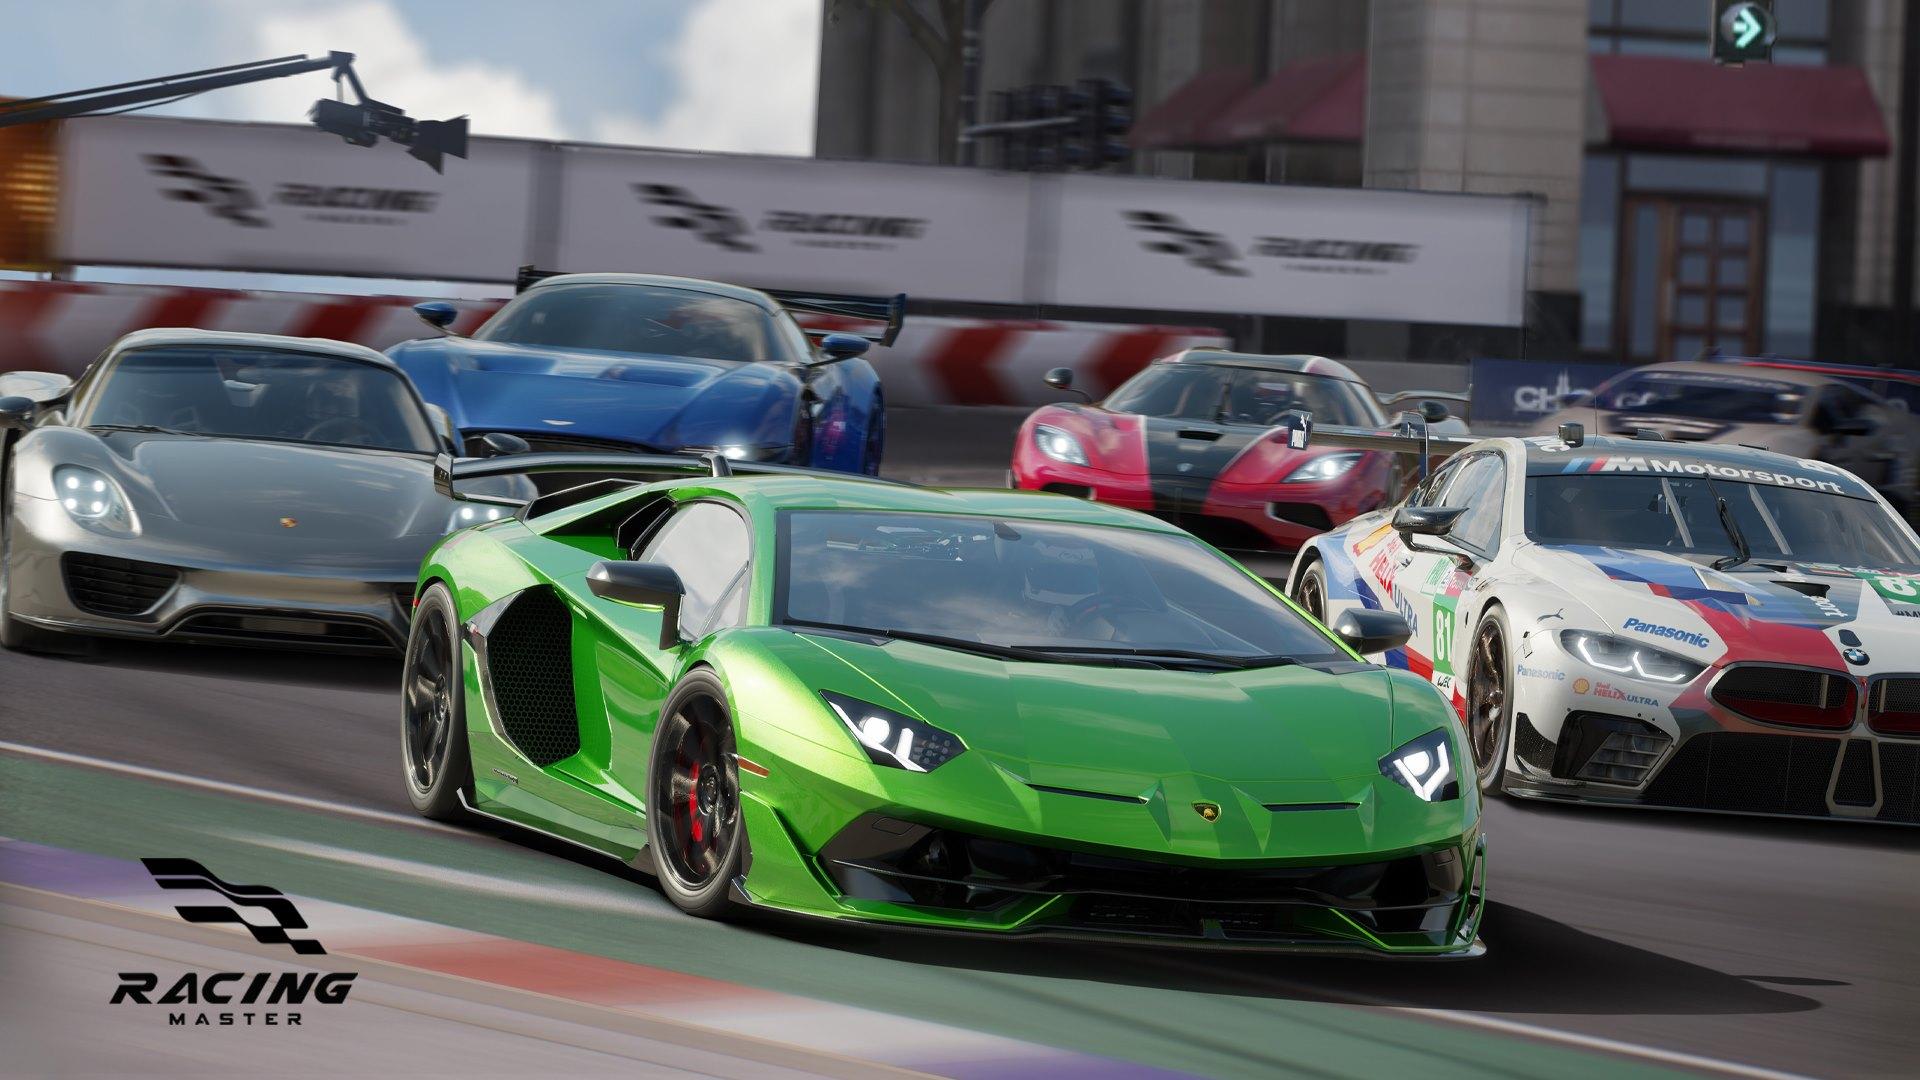 racing master beta 3